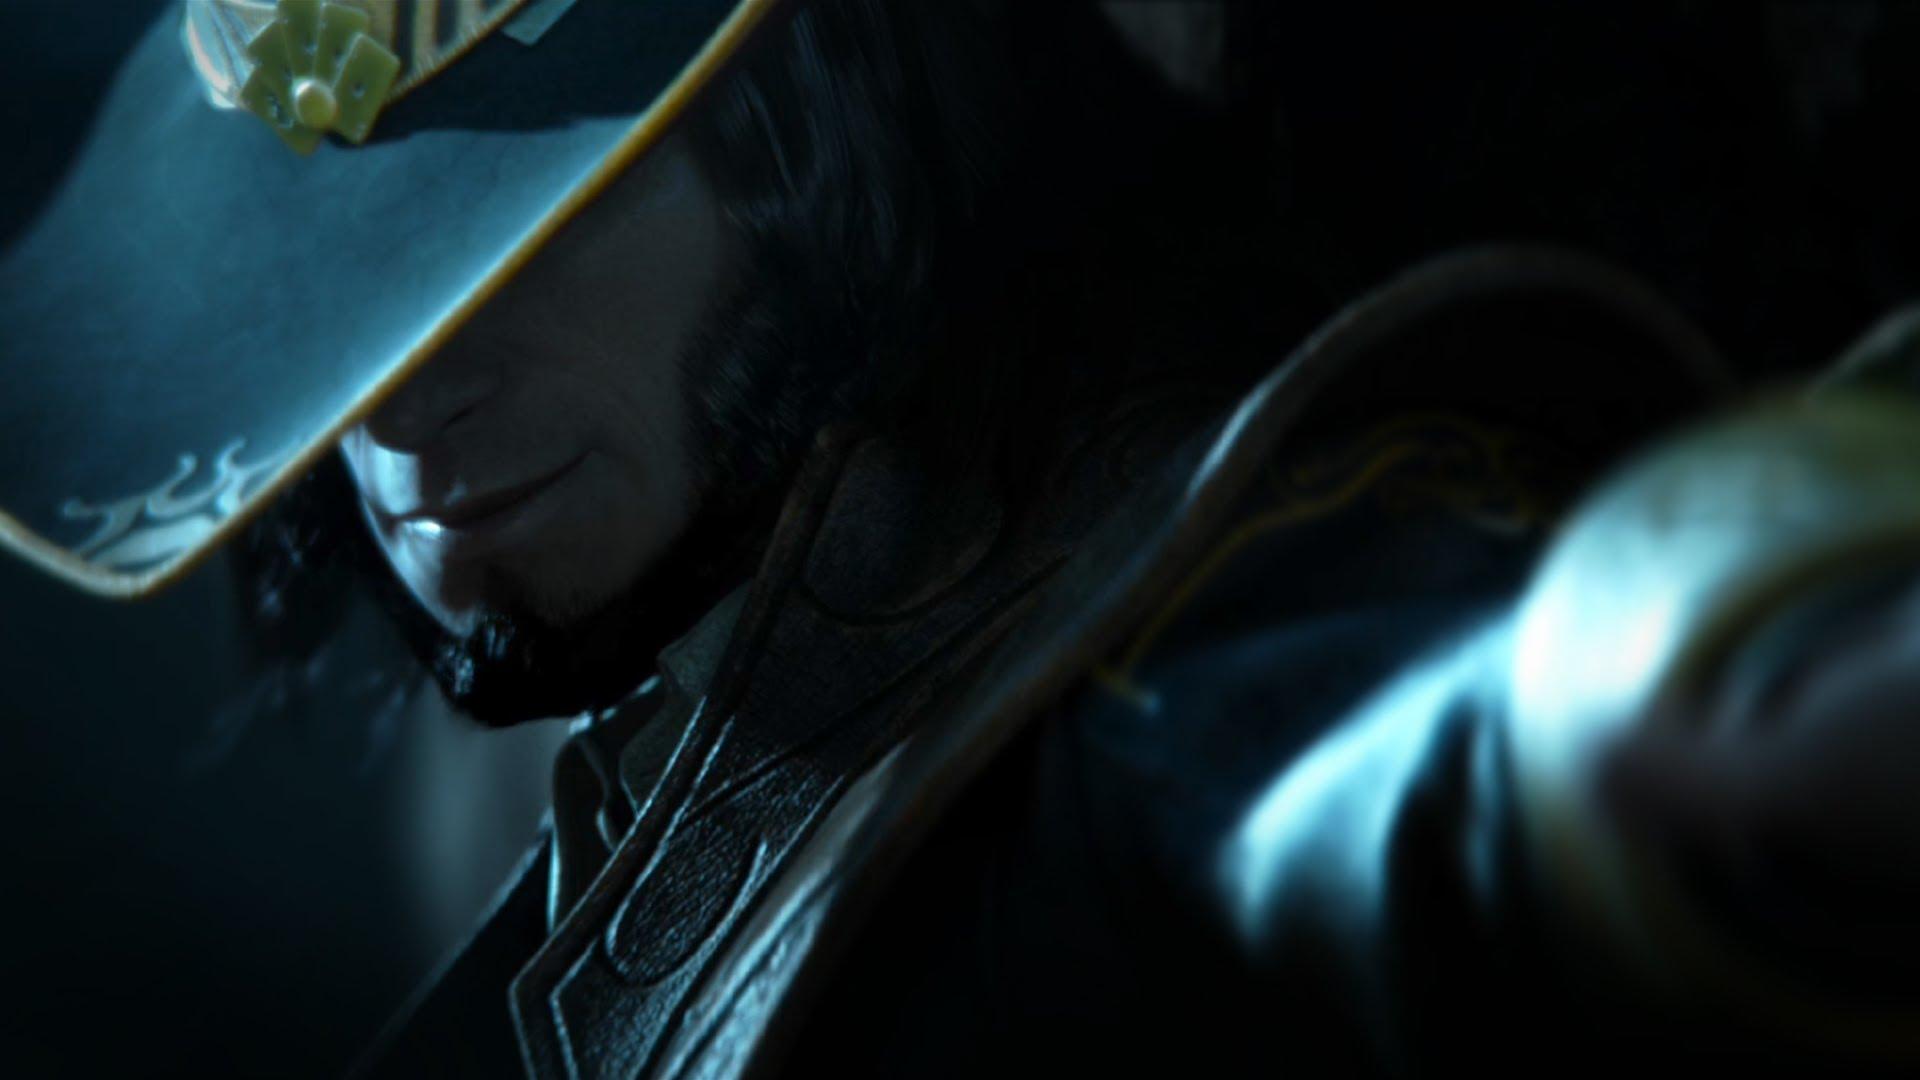 League of Legends Cinematic: A Twist of Fate